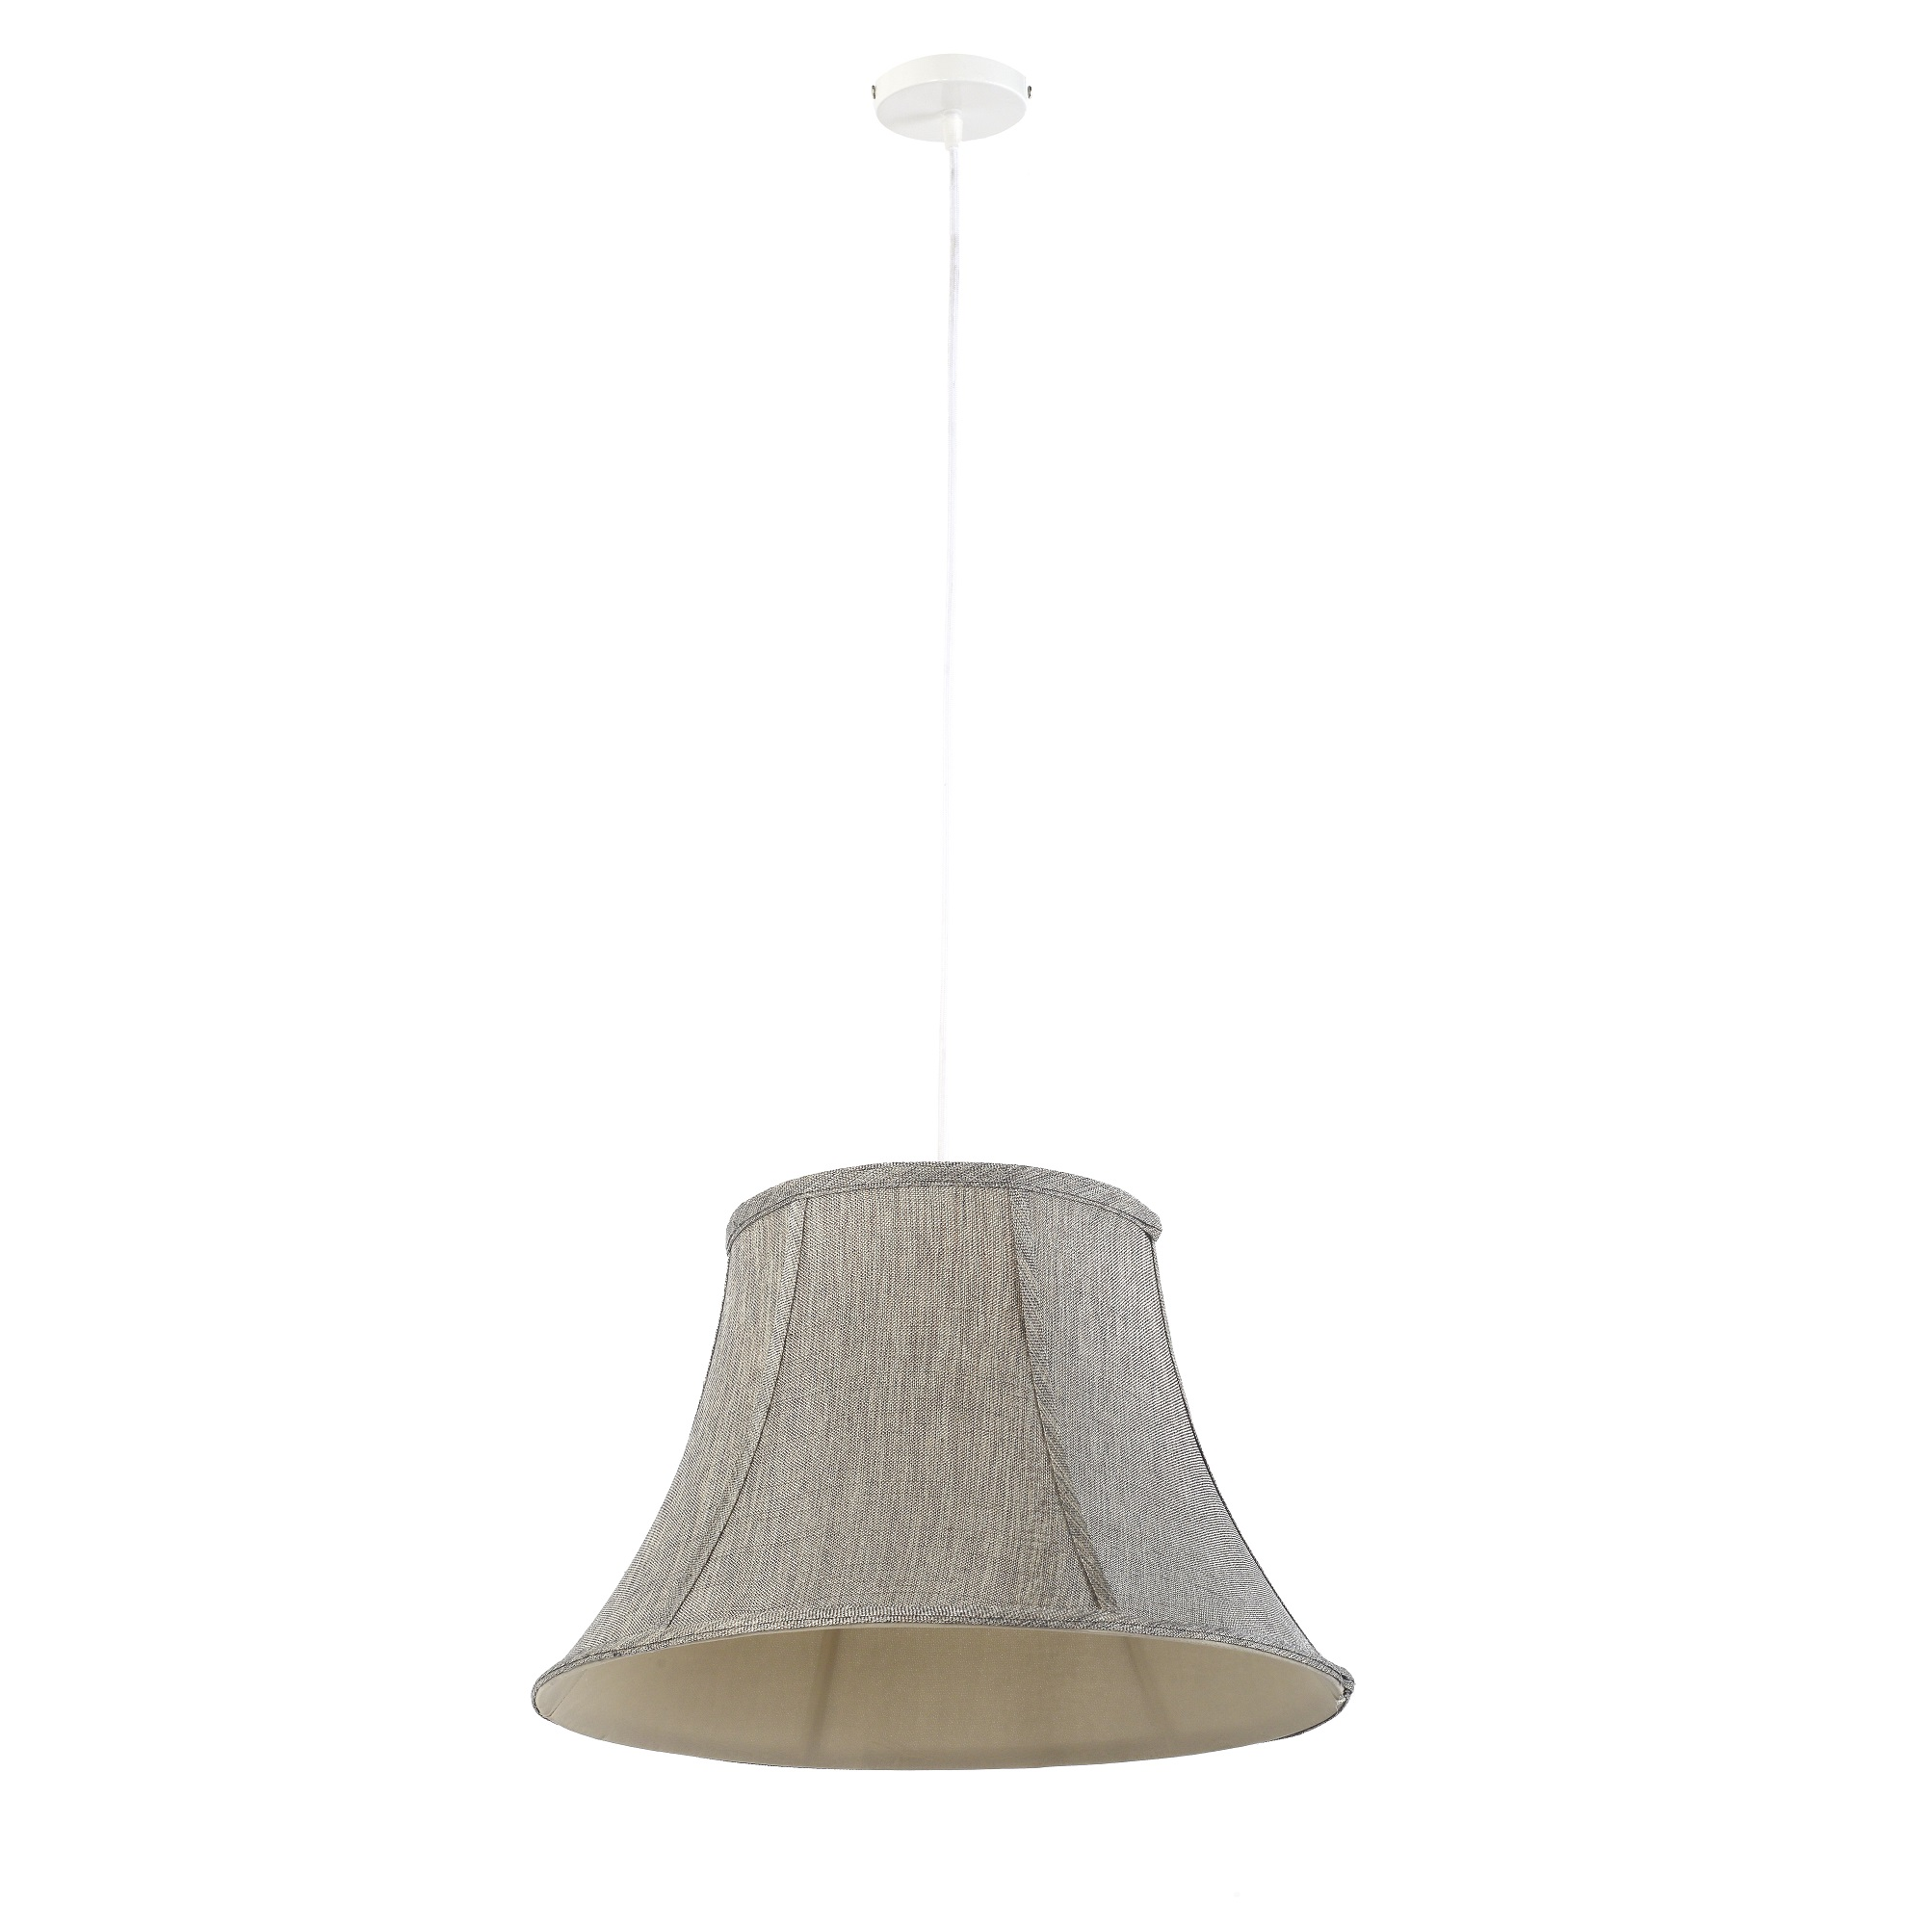 Фото - Подвесной светильник Arti Lampadari Cantare E 1.3.P1 DG подвесной светильник arti lampadari olio e 1 3 p1 br